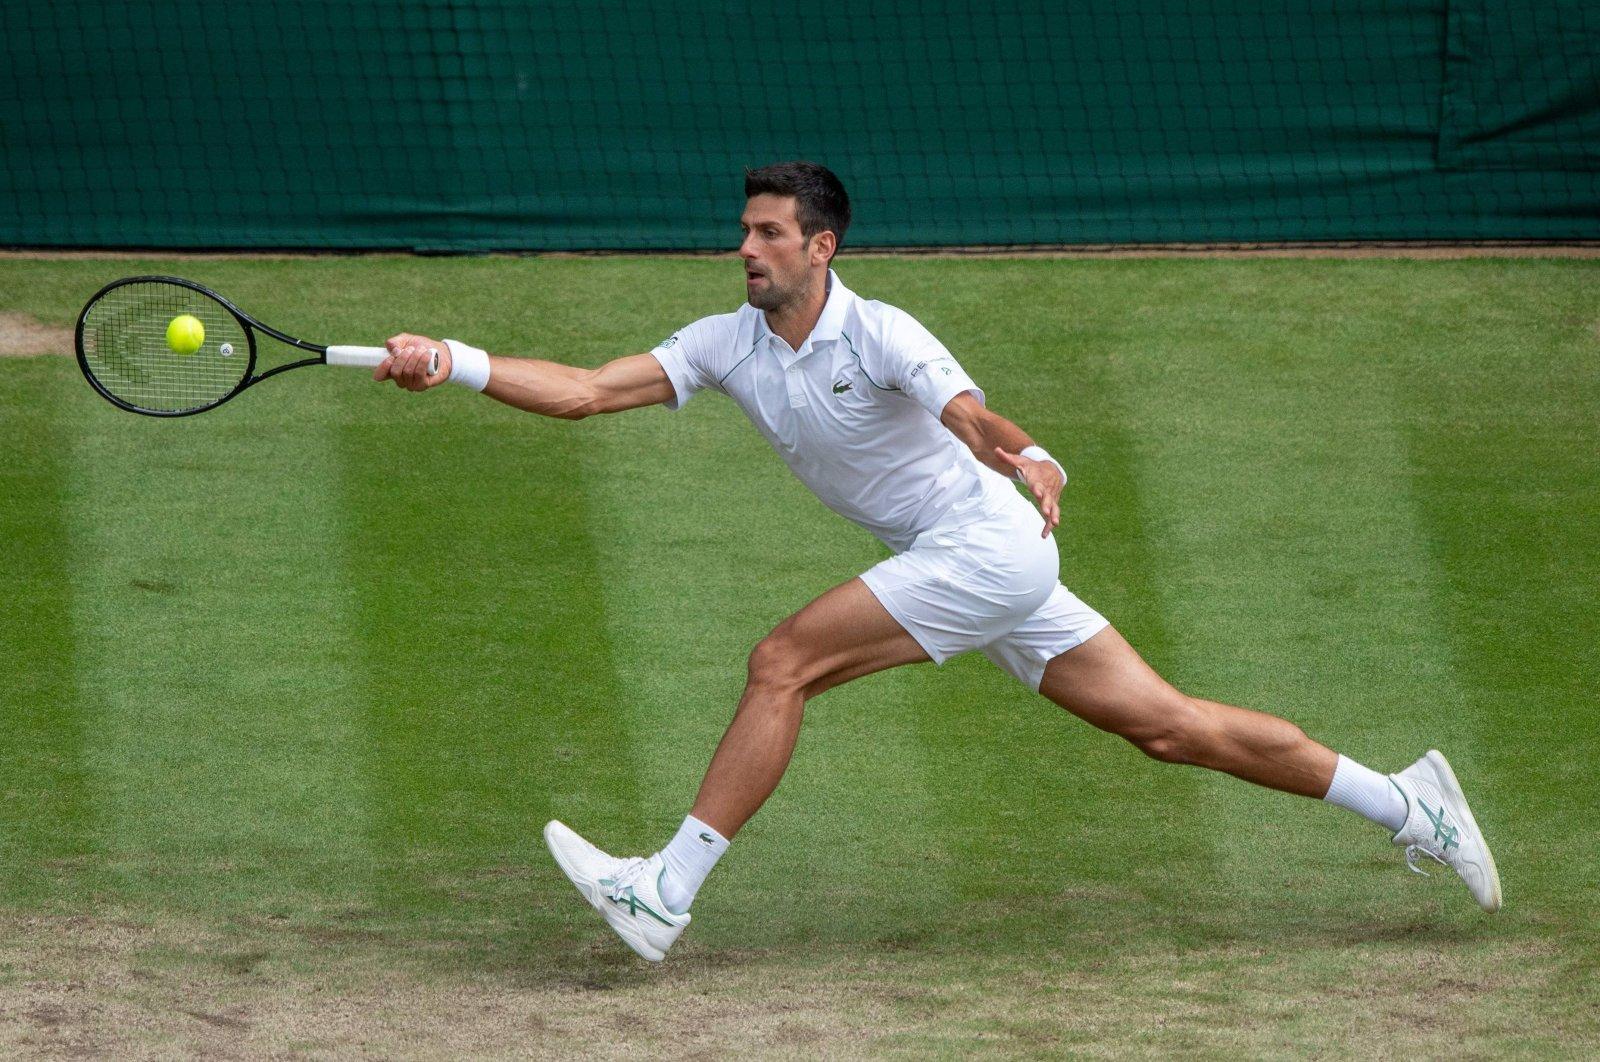 Serbia's Novak Djokovic returns a shot against Hungary's Marton Fucsovics during the Wimbledon men's quarterfinals at The All England Tennis Club in Wimbledon, southwest London, July 7, 2021. (AFP Photo)